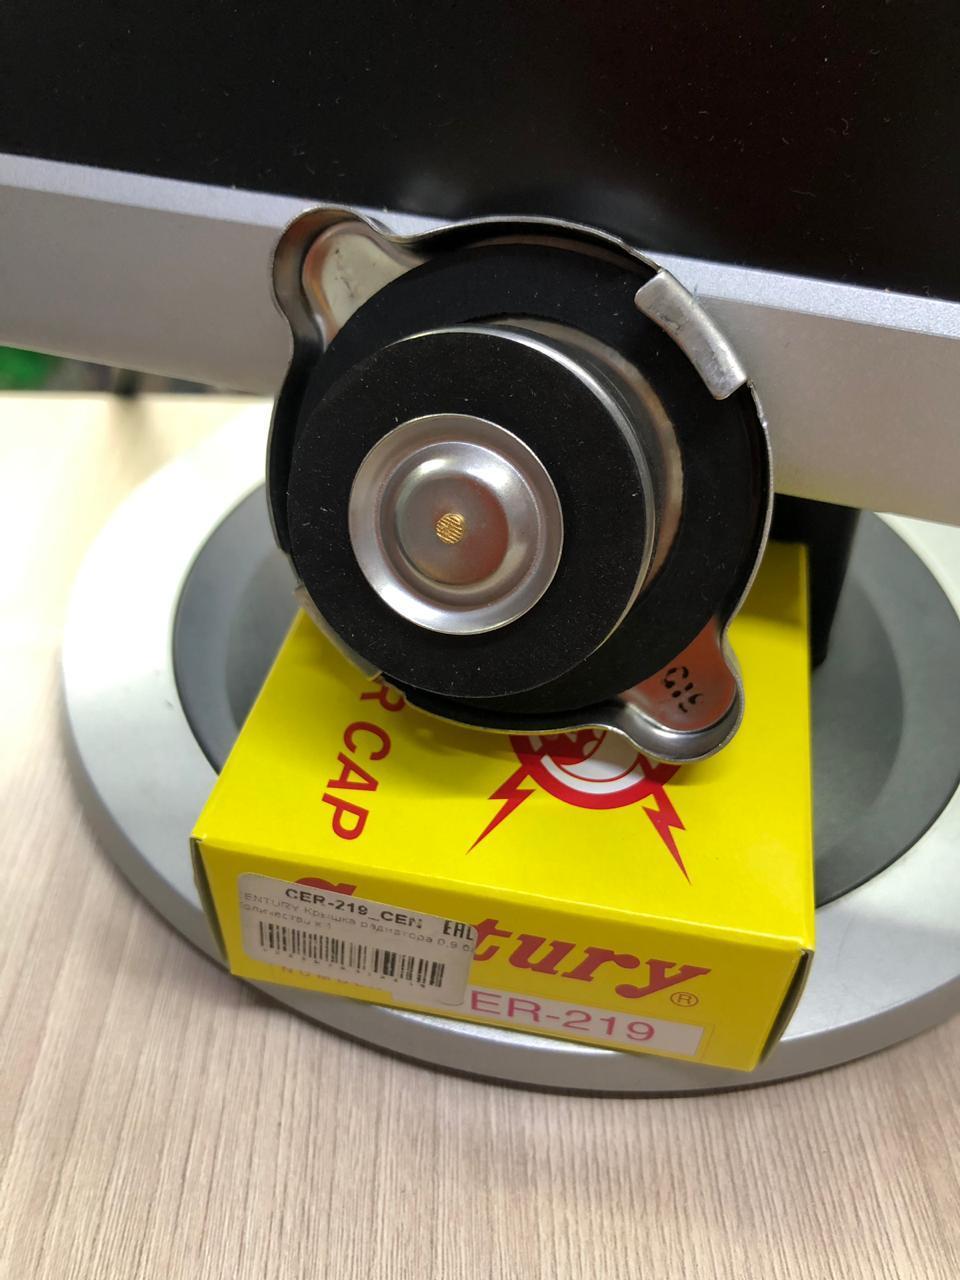 KH-C13 CER-219 (0,9бар) Крышка радиатора Sankei Century Япония 1шт.